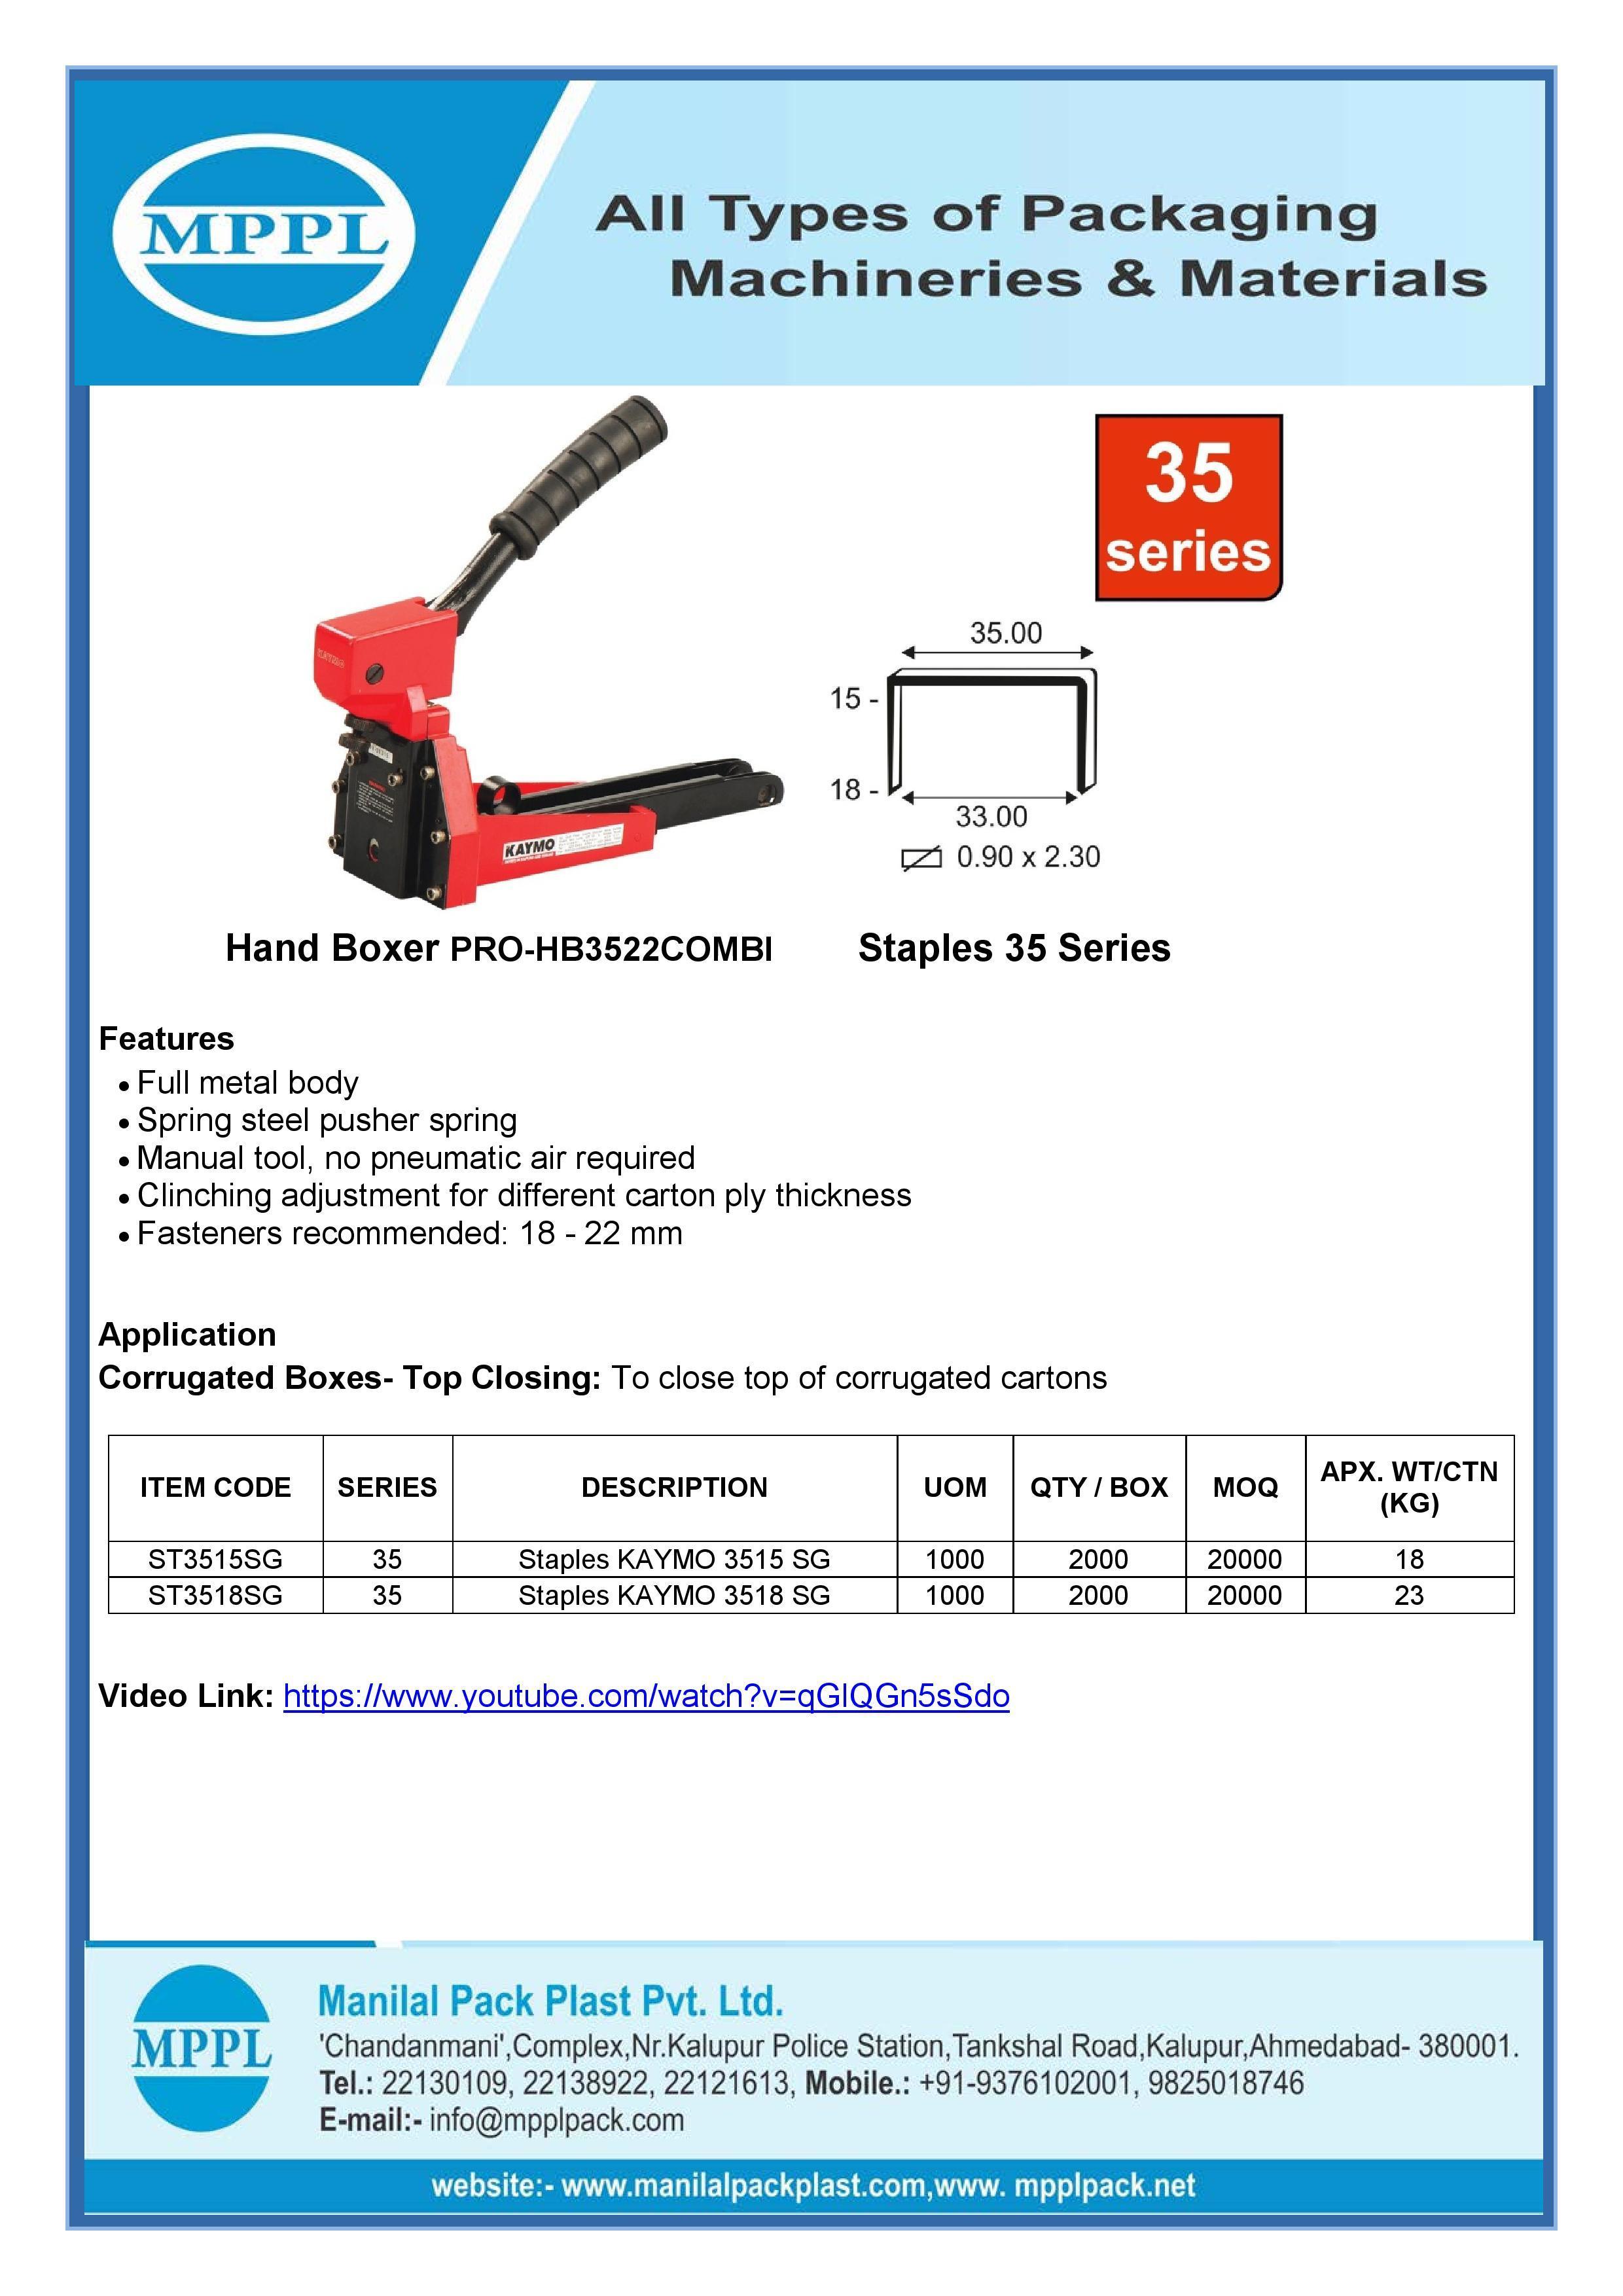 Hand Boxer PRO-HB3522COMBI